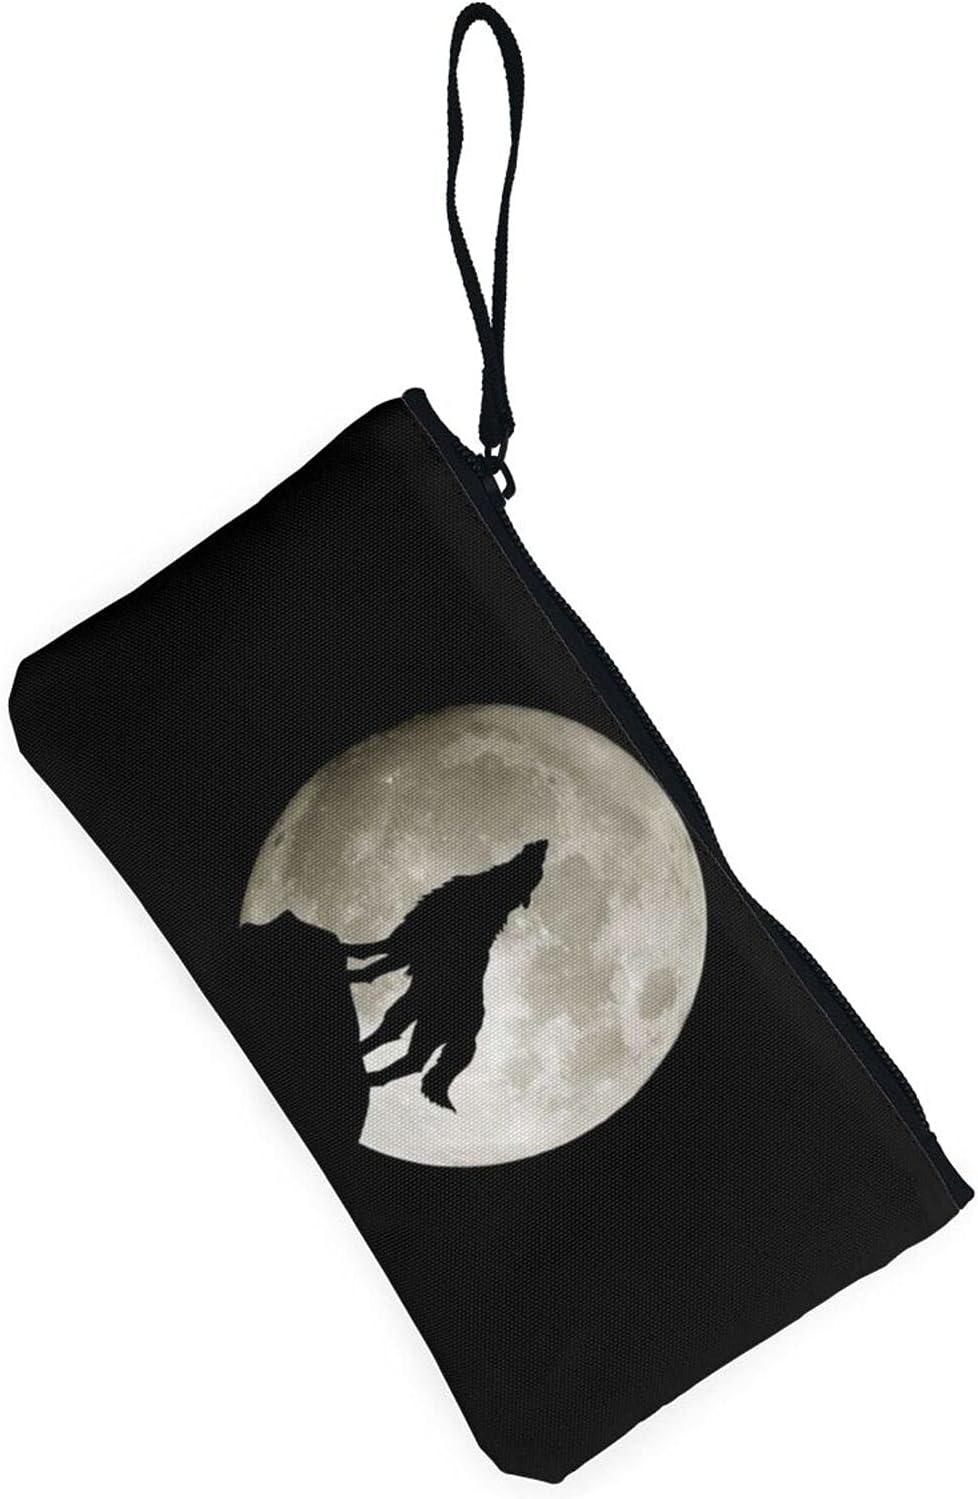 AORRUAM Wolf Howling Moon Canvas Coin Purse,Canvas Zipper Pencil Cases,Canvas Change Purse Pouch Mini Wallet Coin Bag